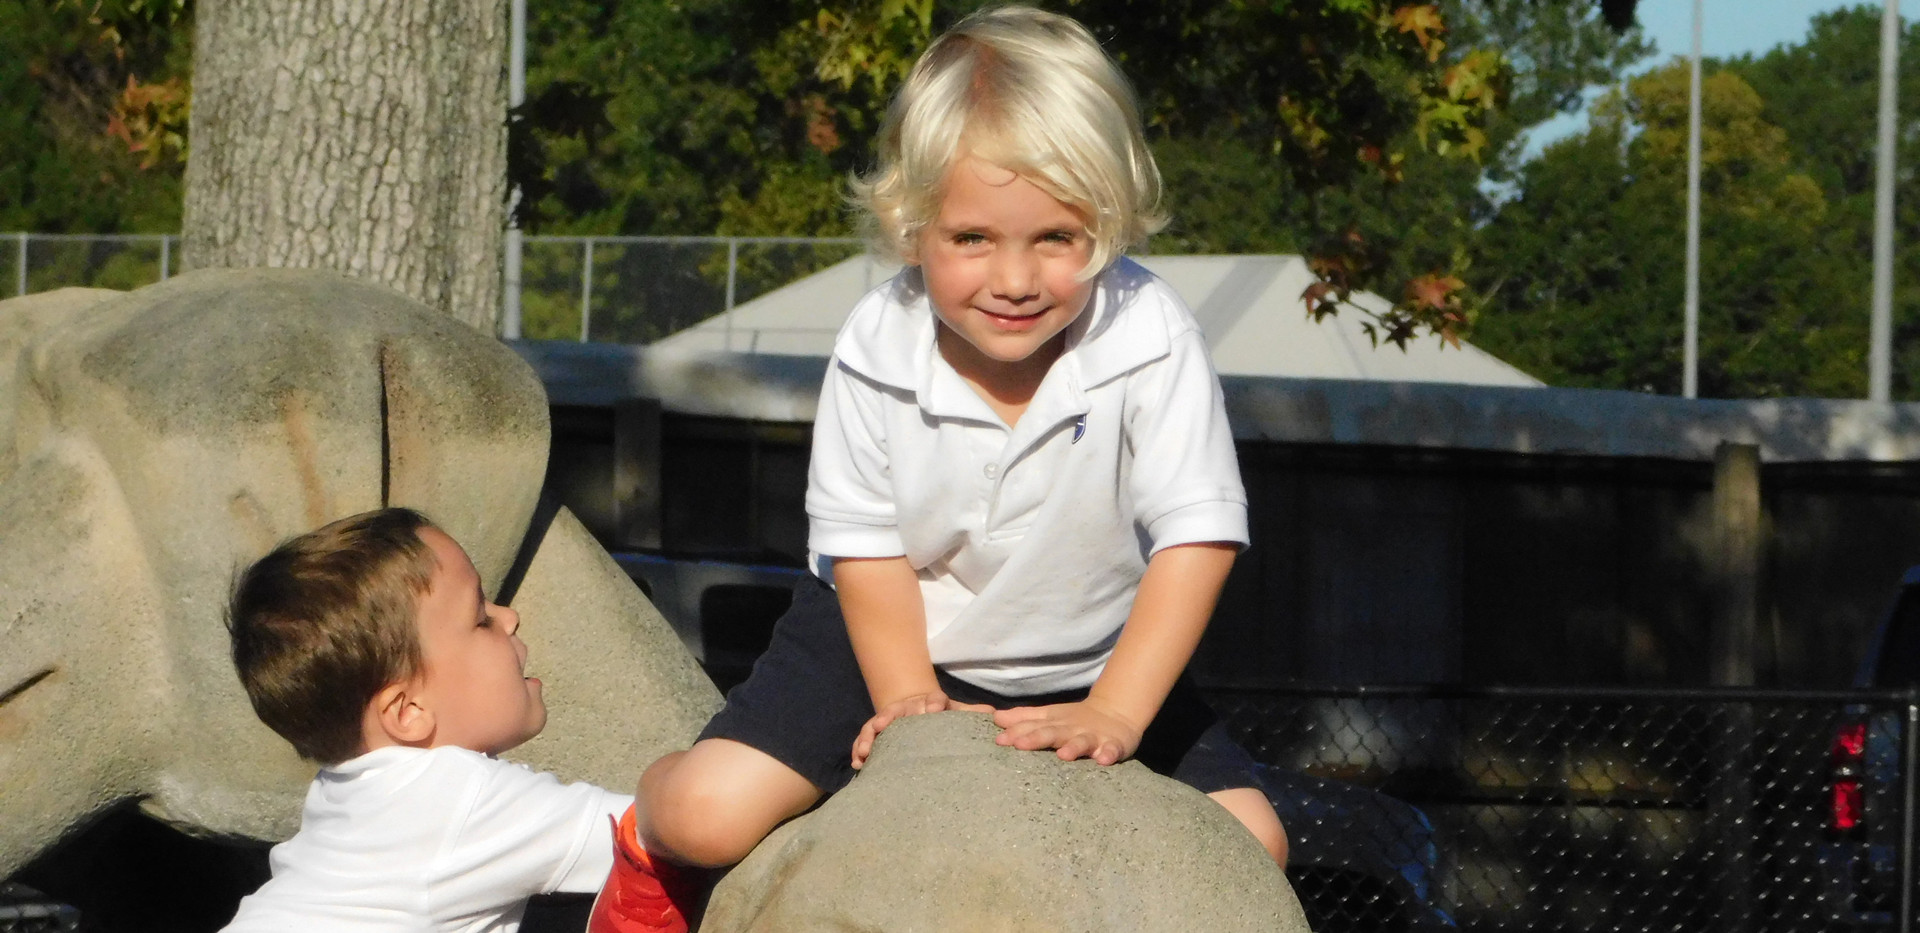 boy playing on playground.JPG